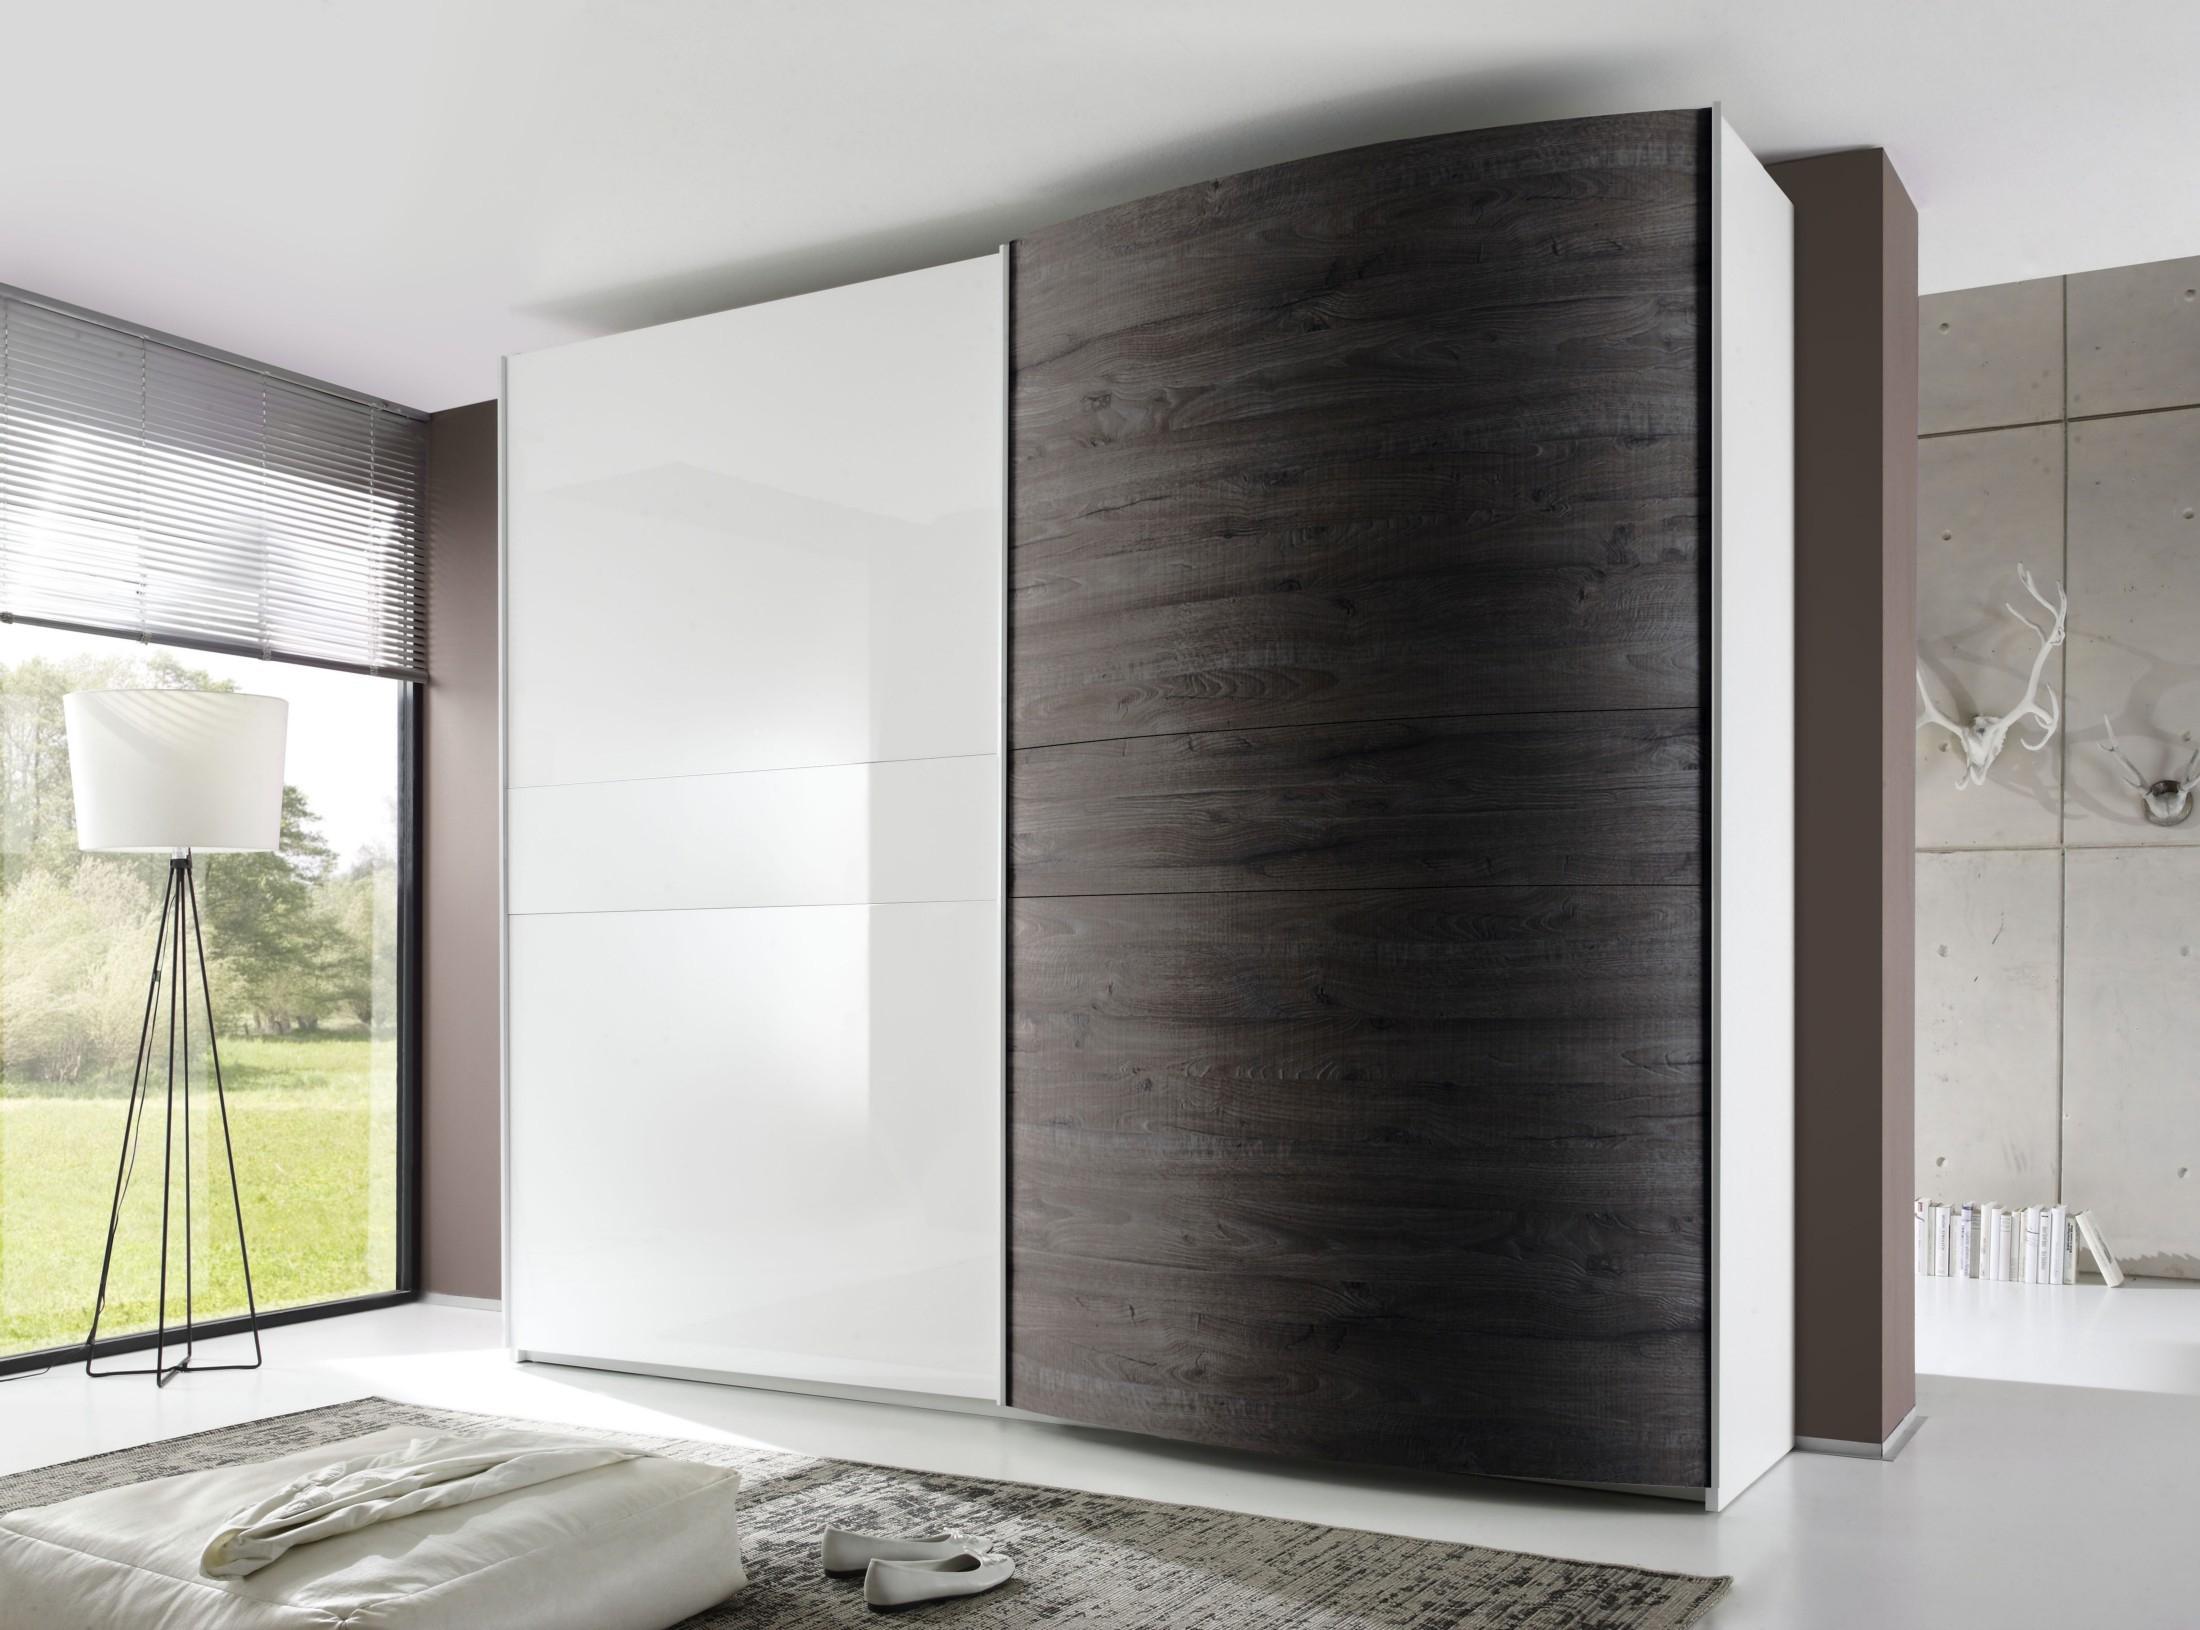 Tambura Curved Sliding Doors Wardrobe White Wenge Buy Online At Within Curved Wardrobe Doors (View 9 of 15)